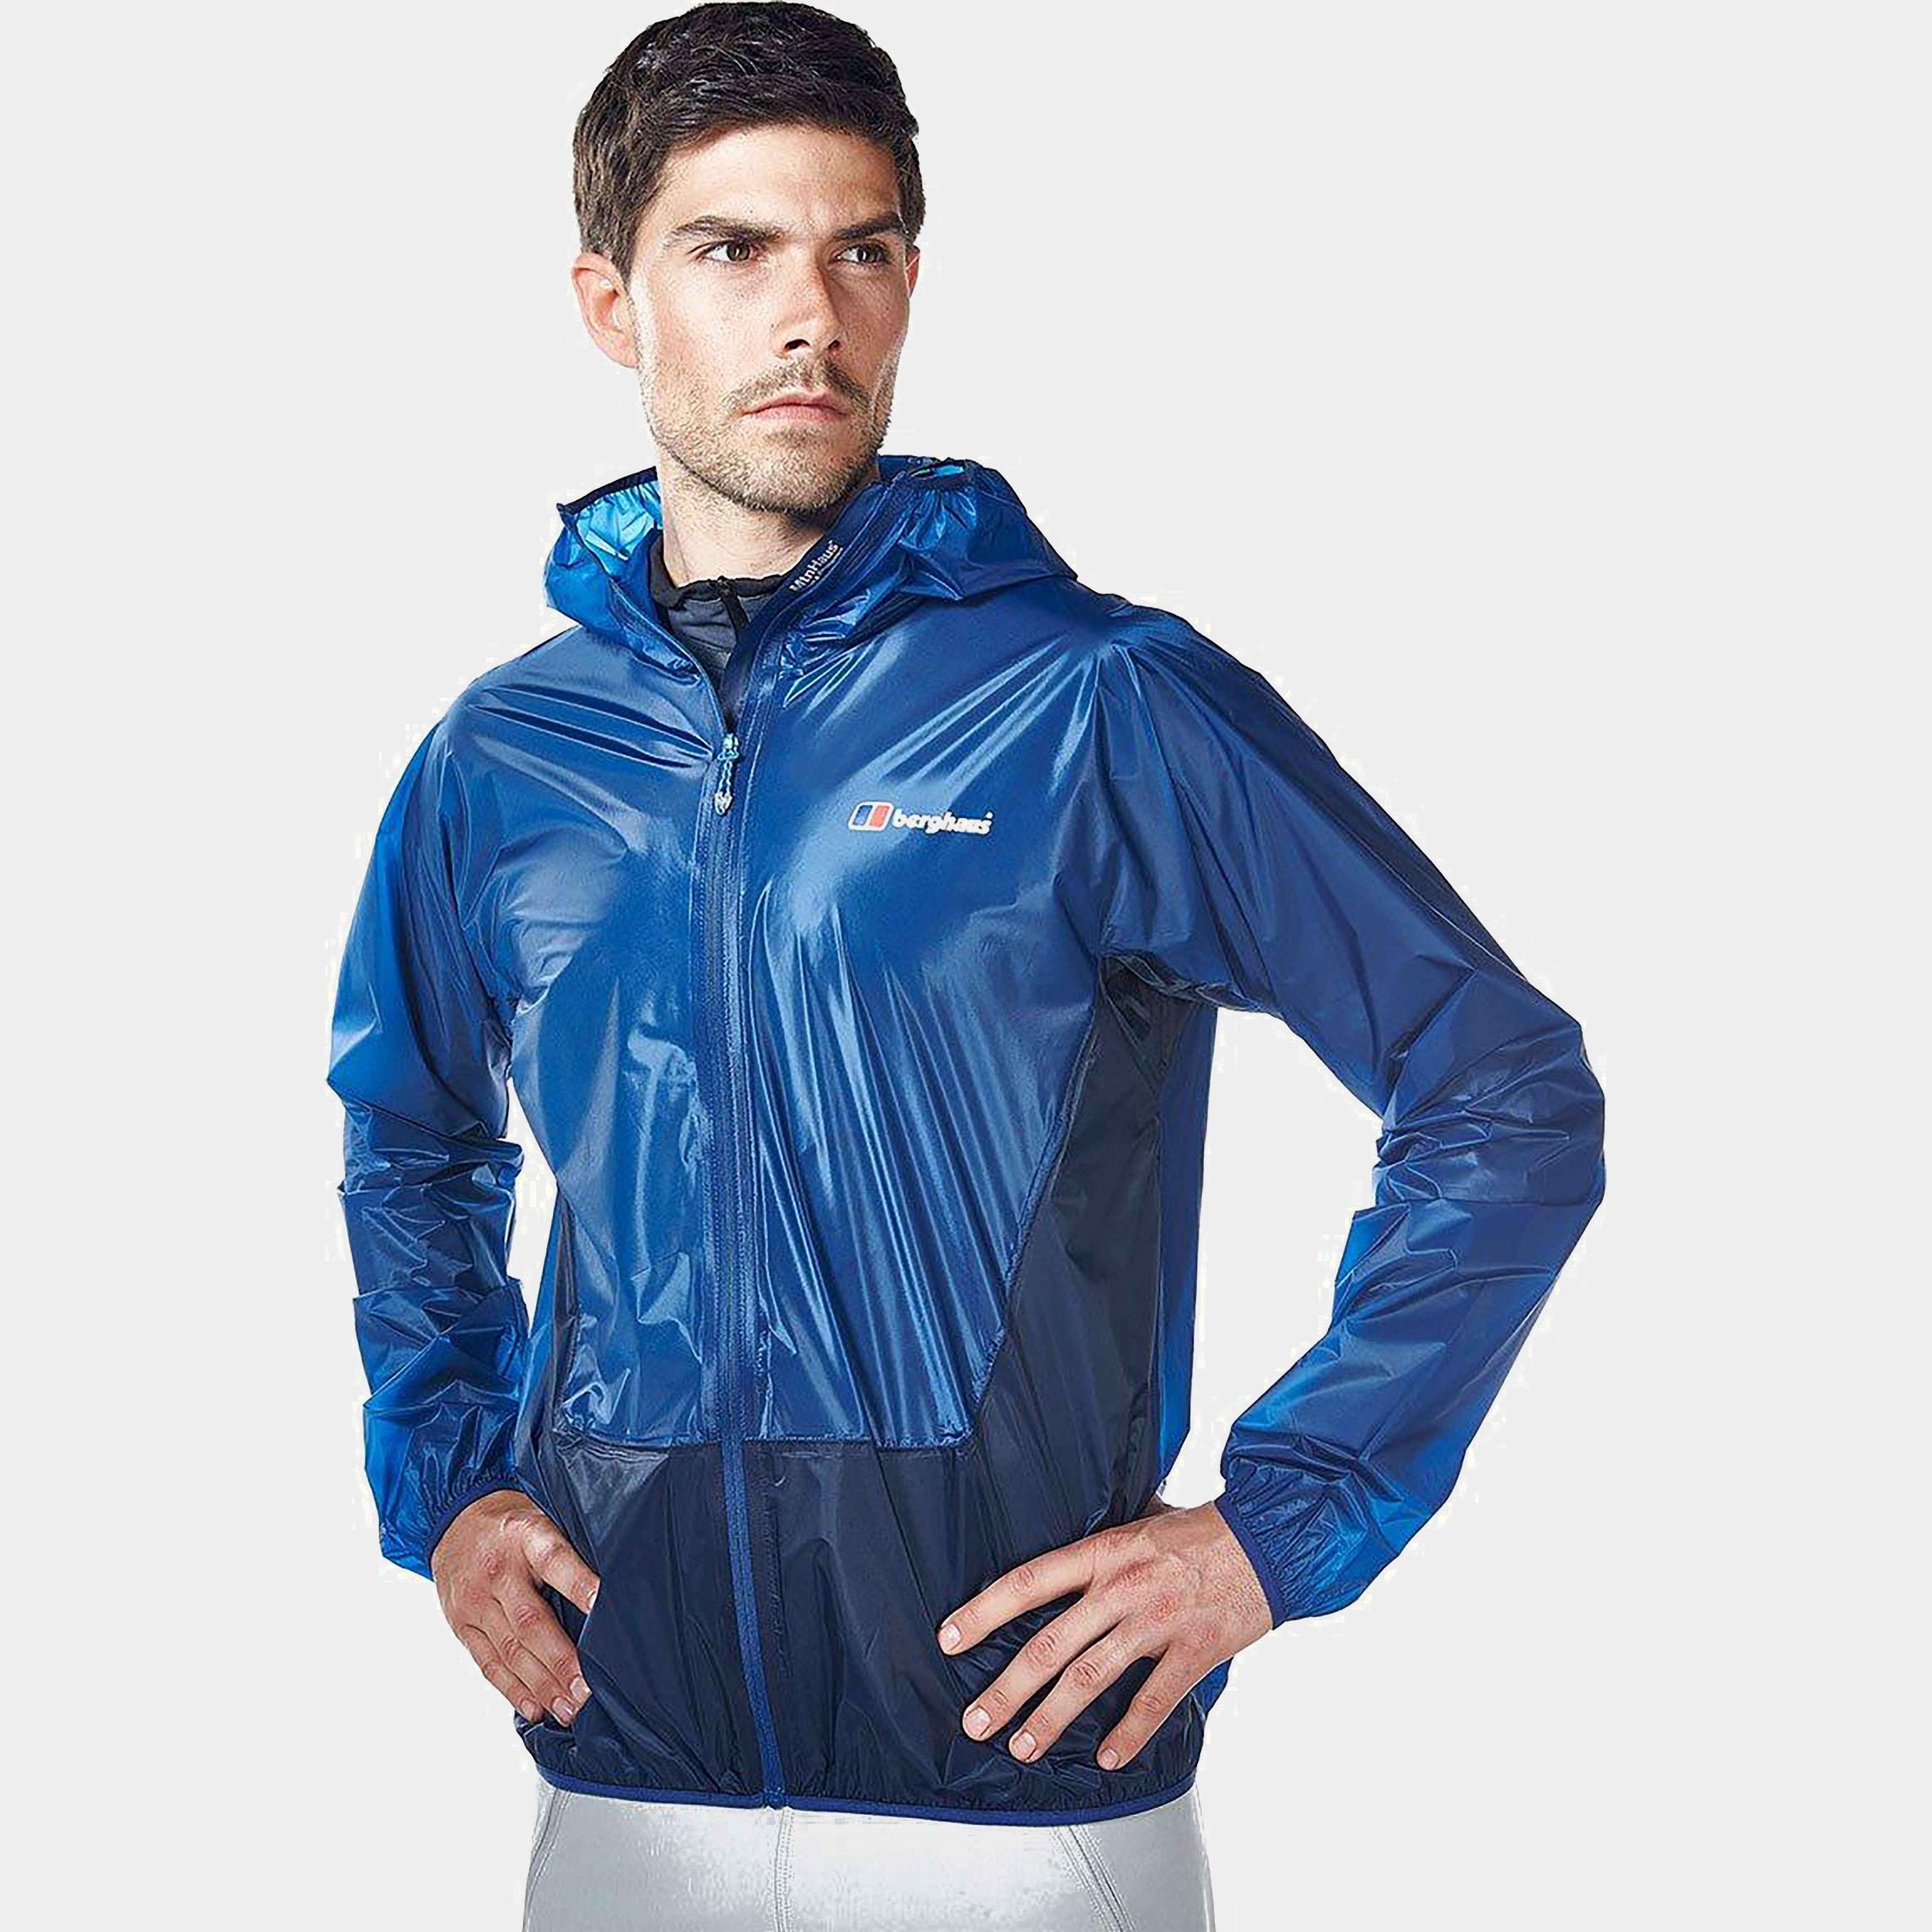 BERGHAUS Men's Extrem Waterproof Hyper Jacket